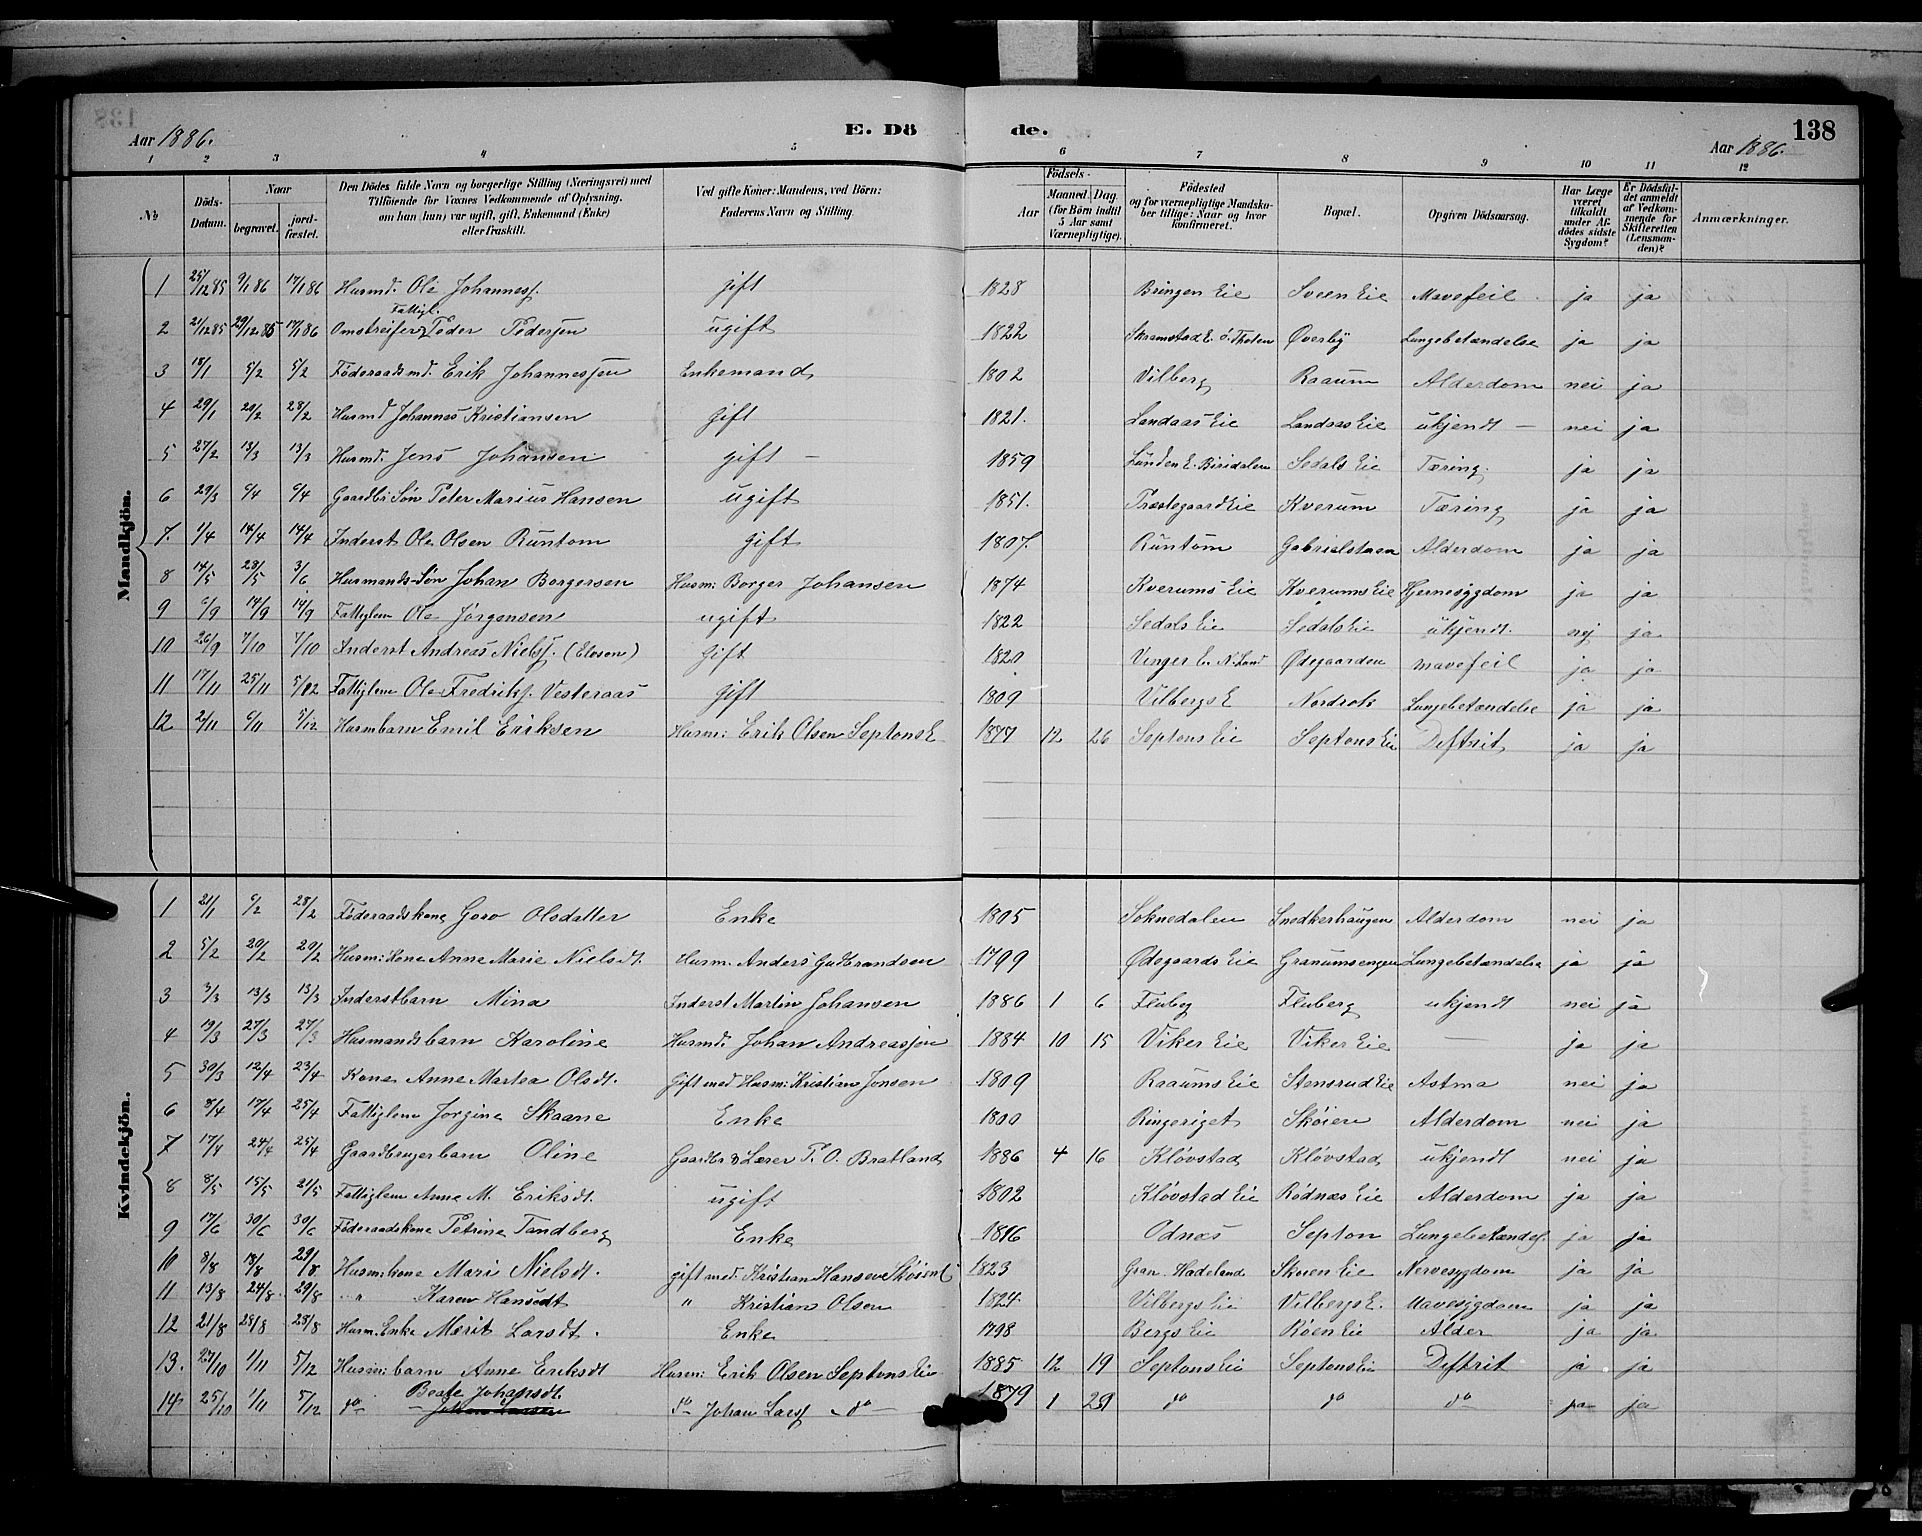 SAH, Søndre Land prestekontor, L/L0003: Klokkerbok nr. 3, 1884-1902, s. 138